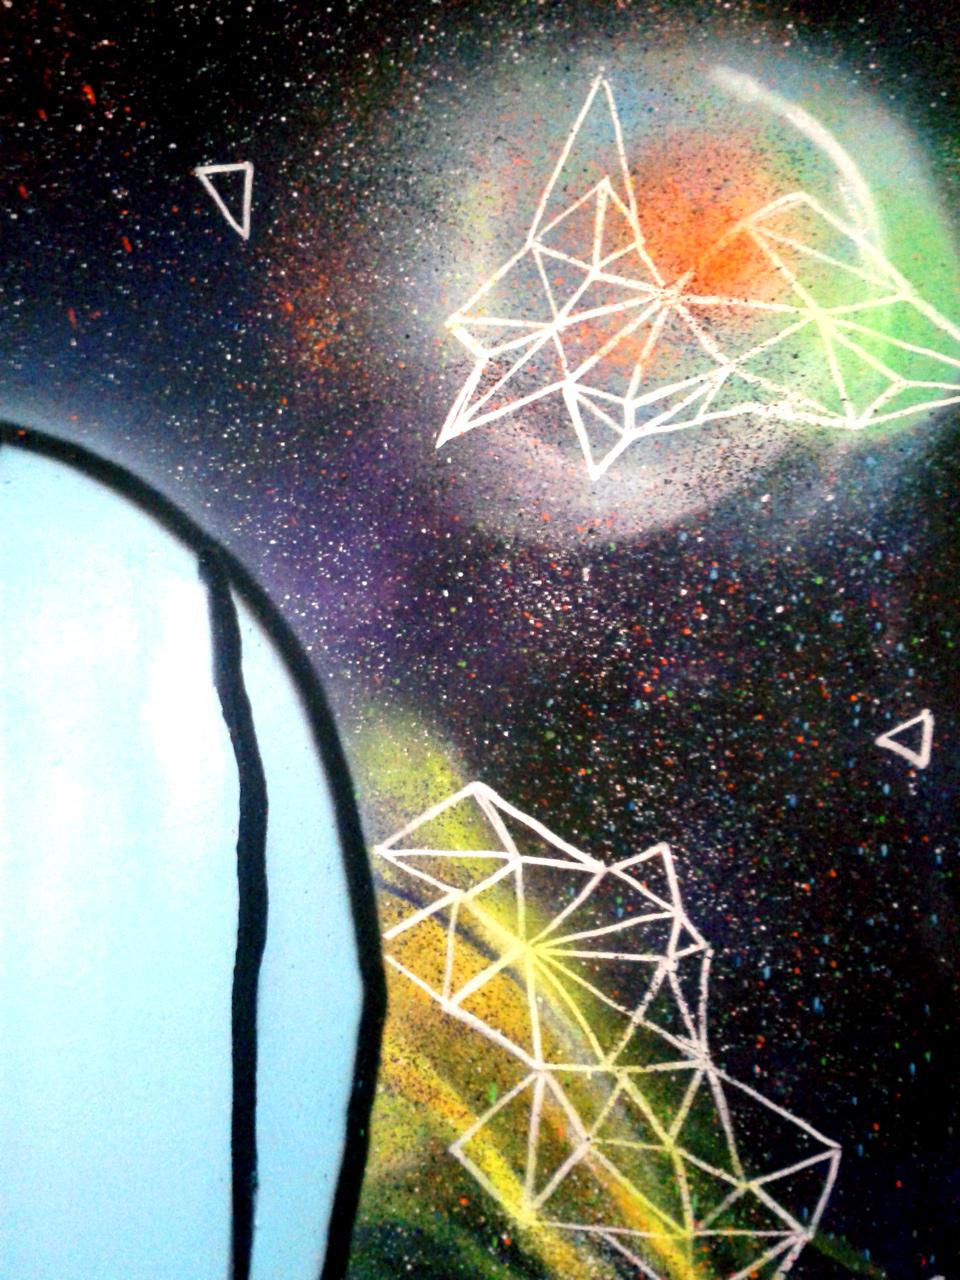 Fresque Graffiti Voyages Insolites Quimper. Sept 2017.